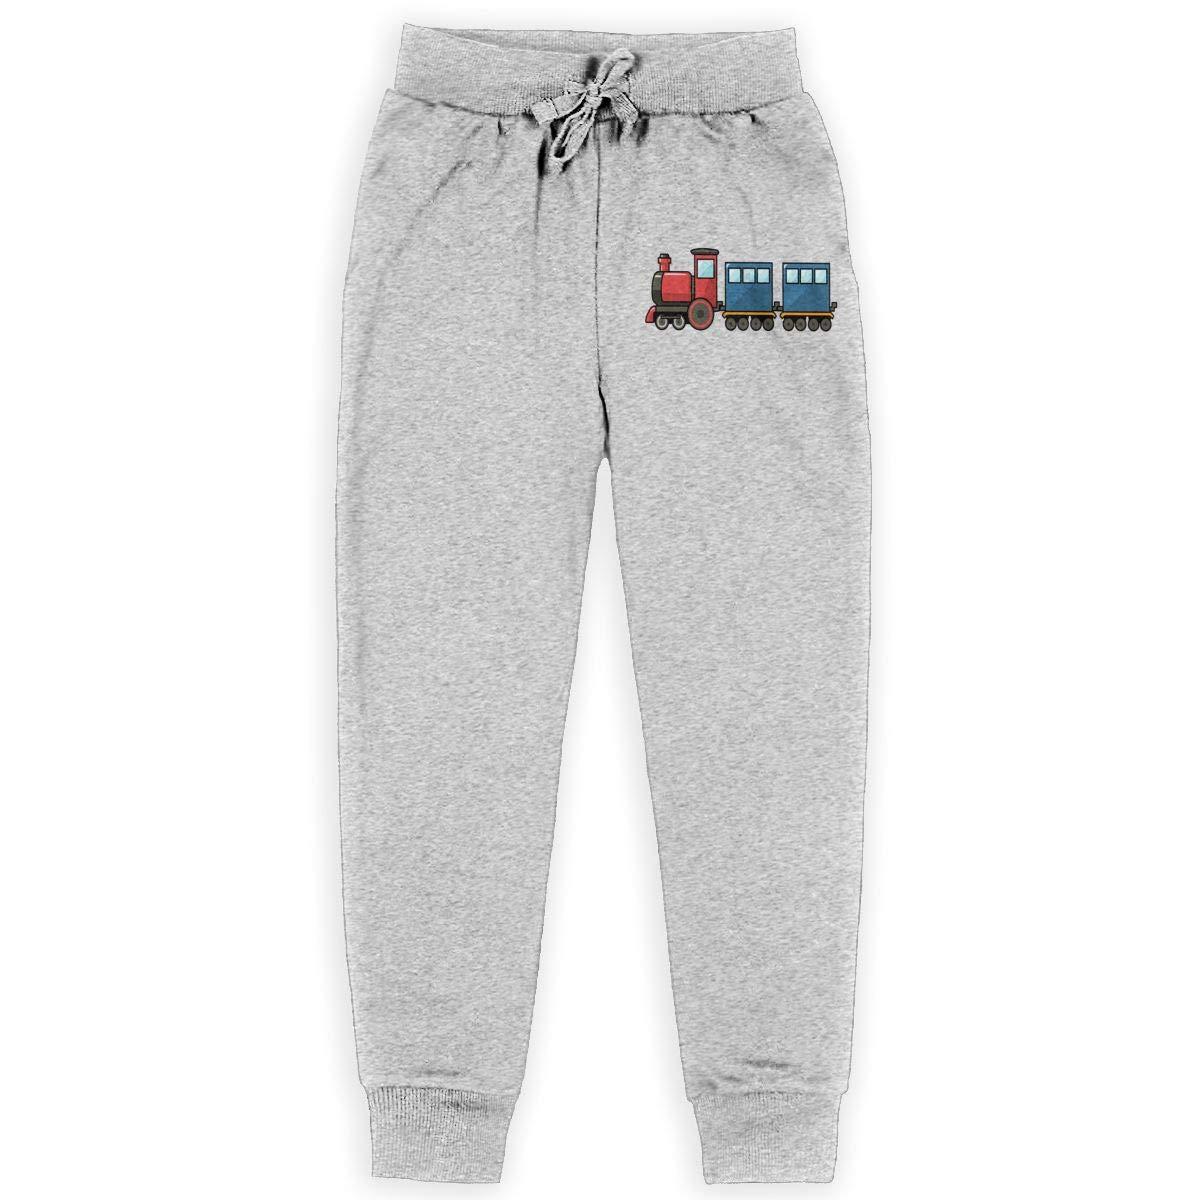 Vintage Train Teenagers Cotton Sweatpants Comfortable Joggers Pants Active Pants